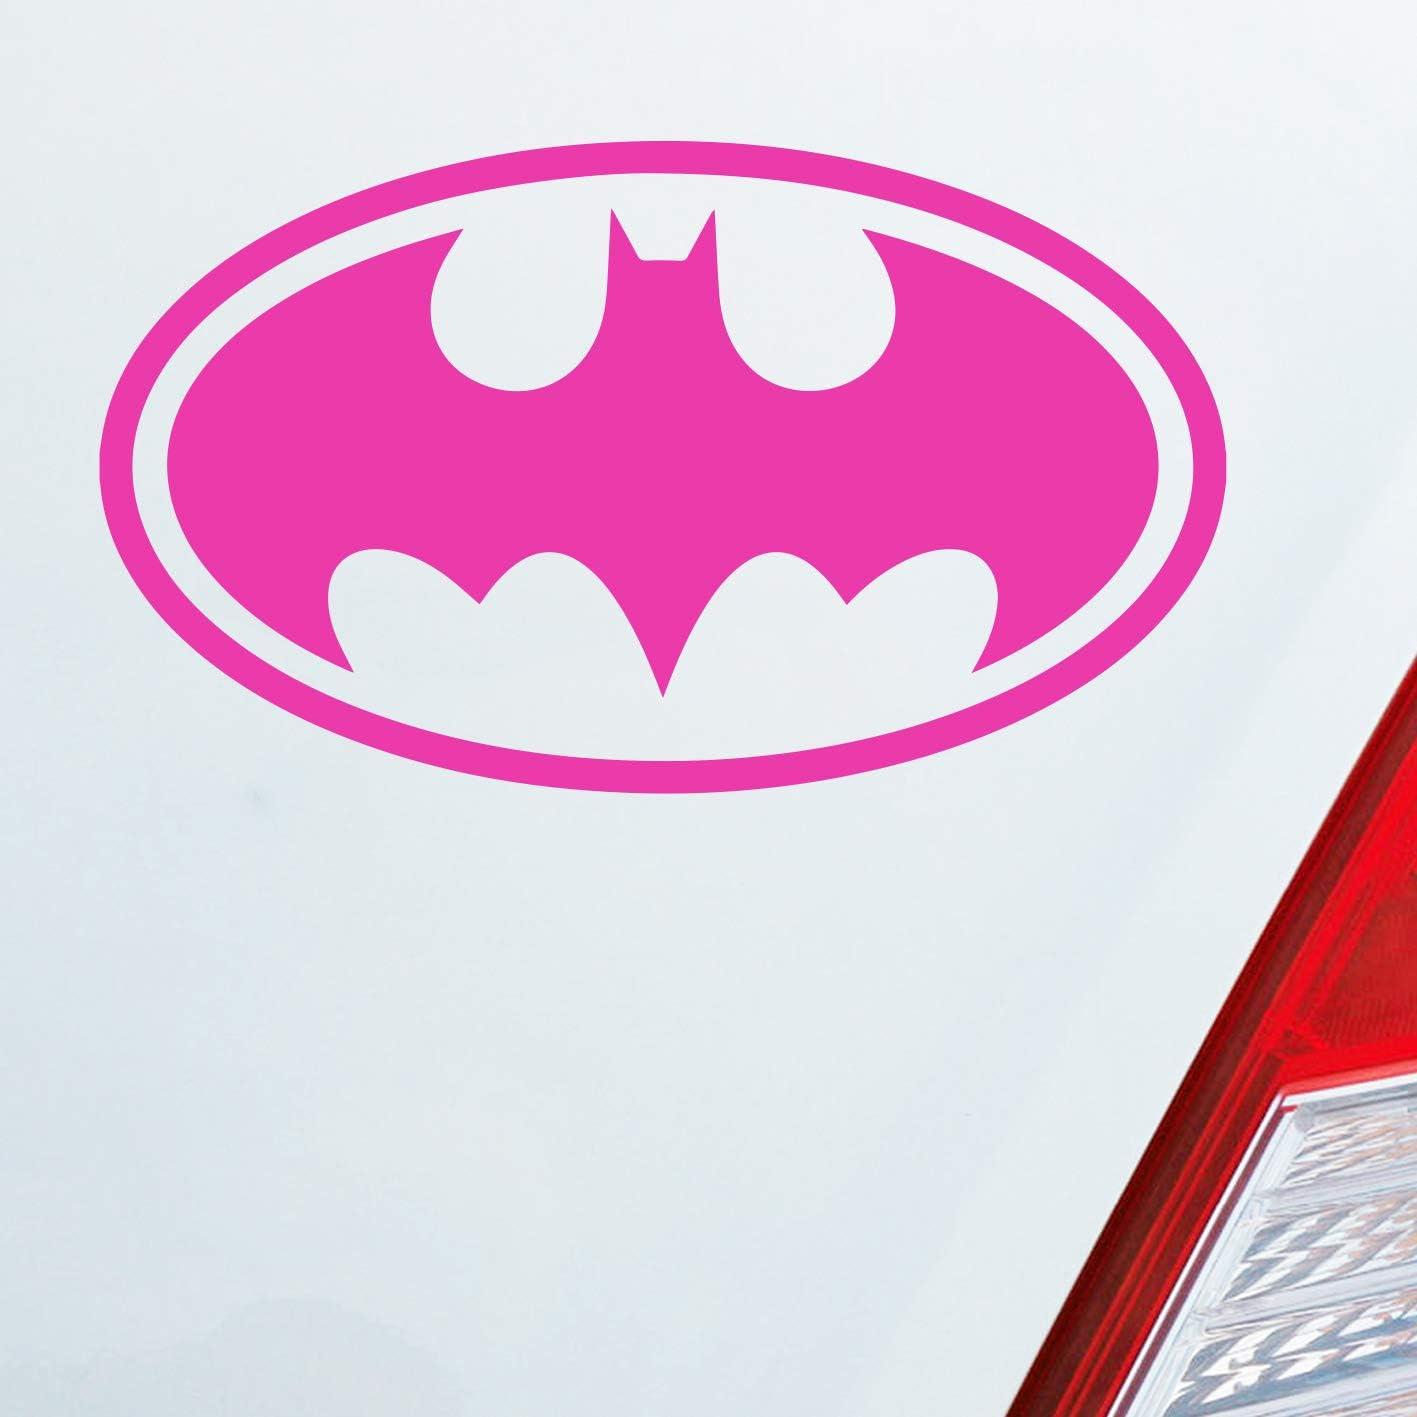 Hellweg Druckerei Film autocollant Batman pour voiture 6/x 10/cm